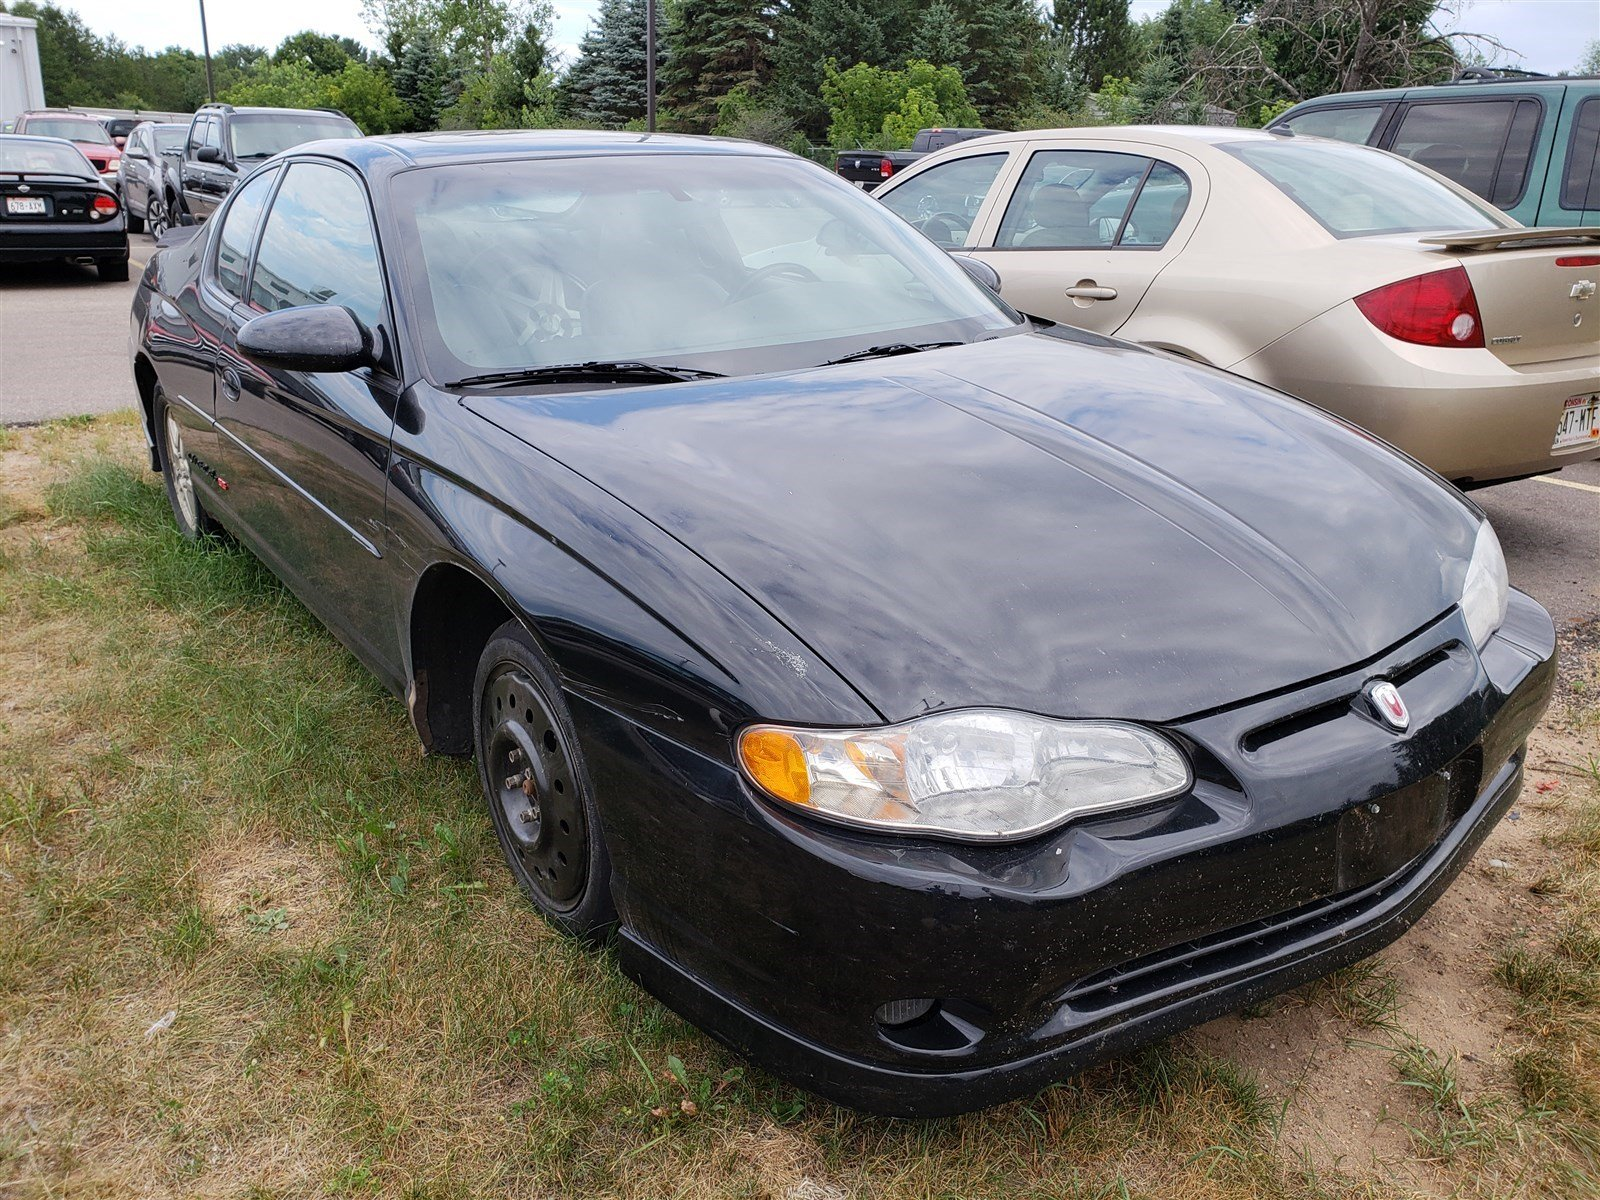 2001 Chevrolet Monte Carlo SS Coupe